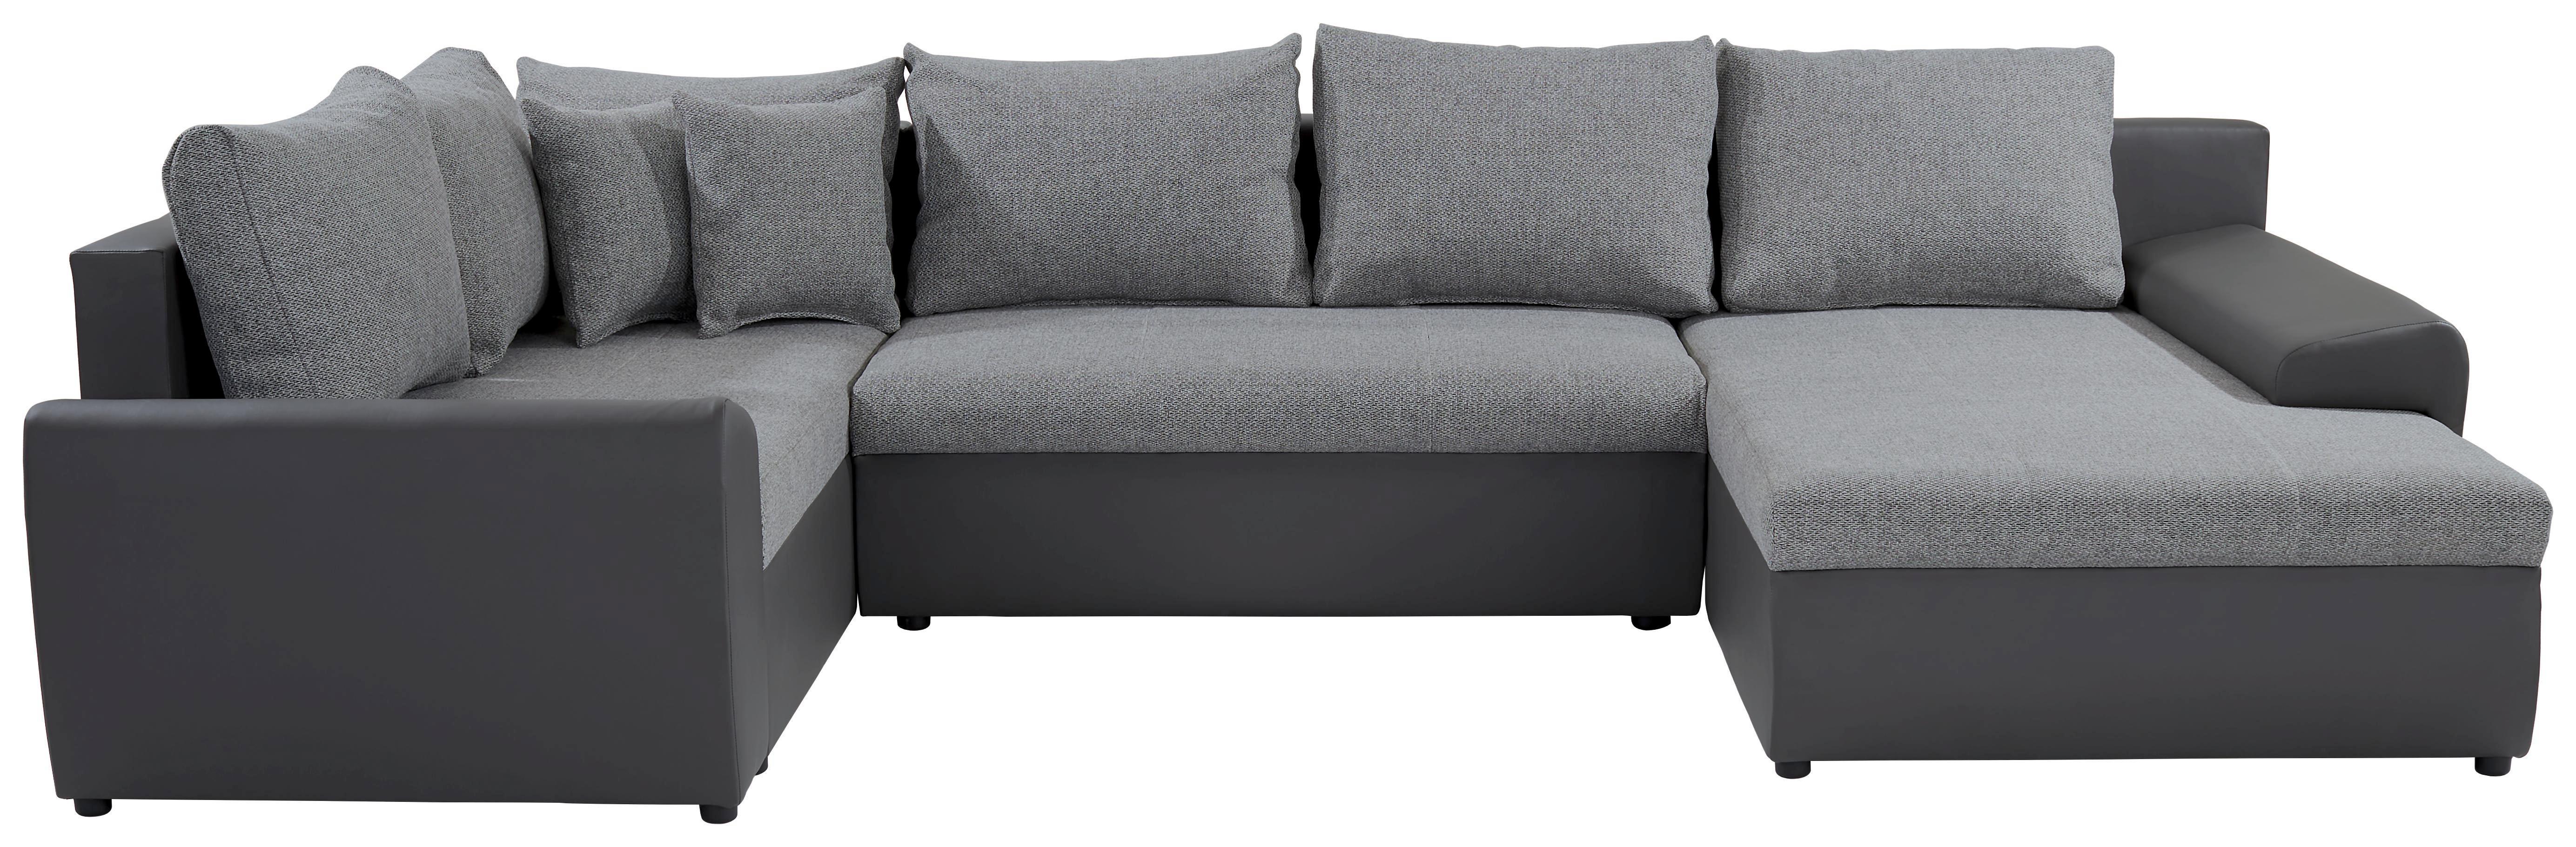 Ecksofa rustikal  Polstermöbel günstig online kaufen | Möbelix